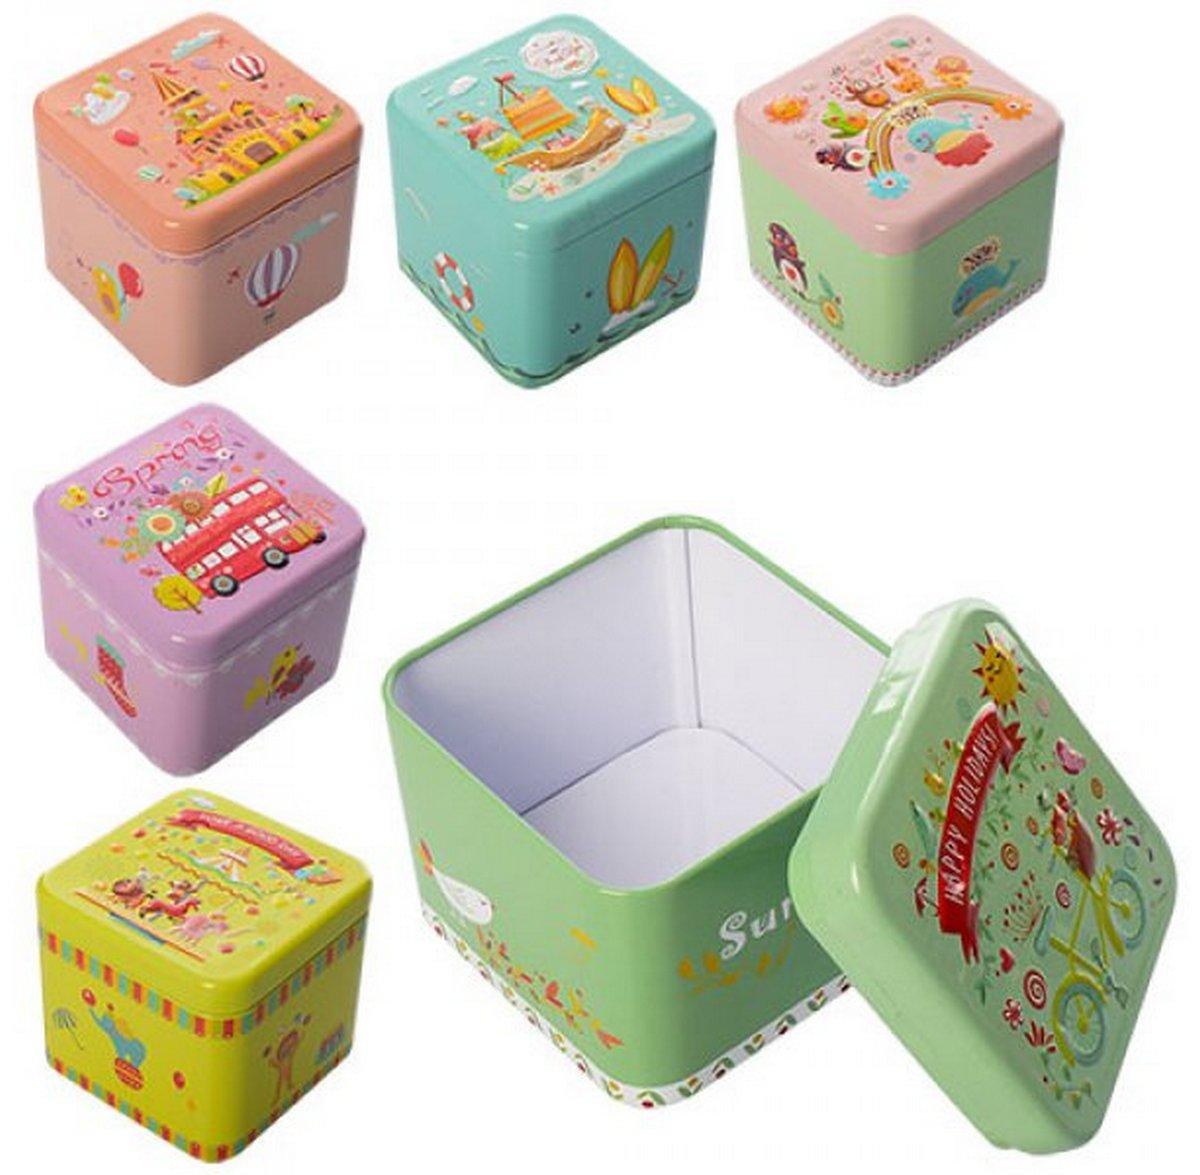 bk toys ltd. Шкатулка 6 видов металлическая X11499